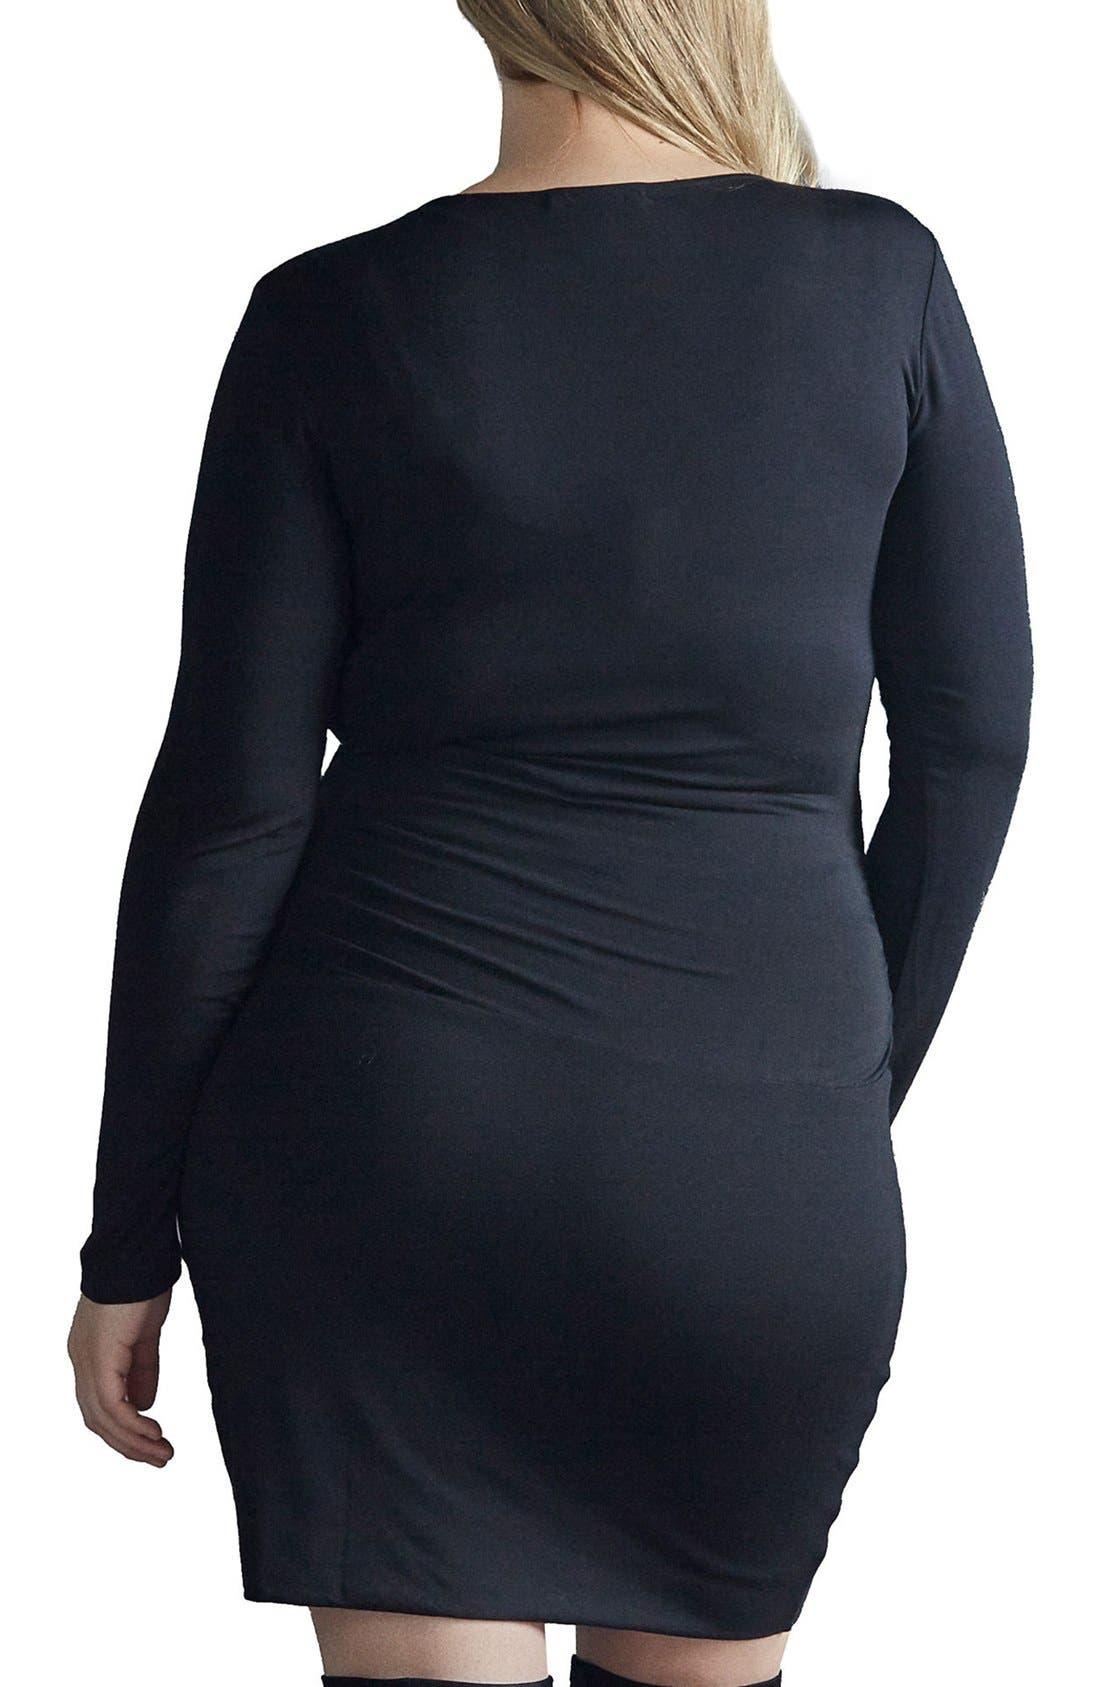 Peaches Surplice Body-Con Dress,                             Alternate thumbnail 2, color,                             001